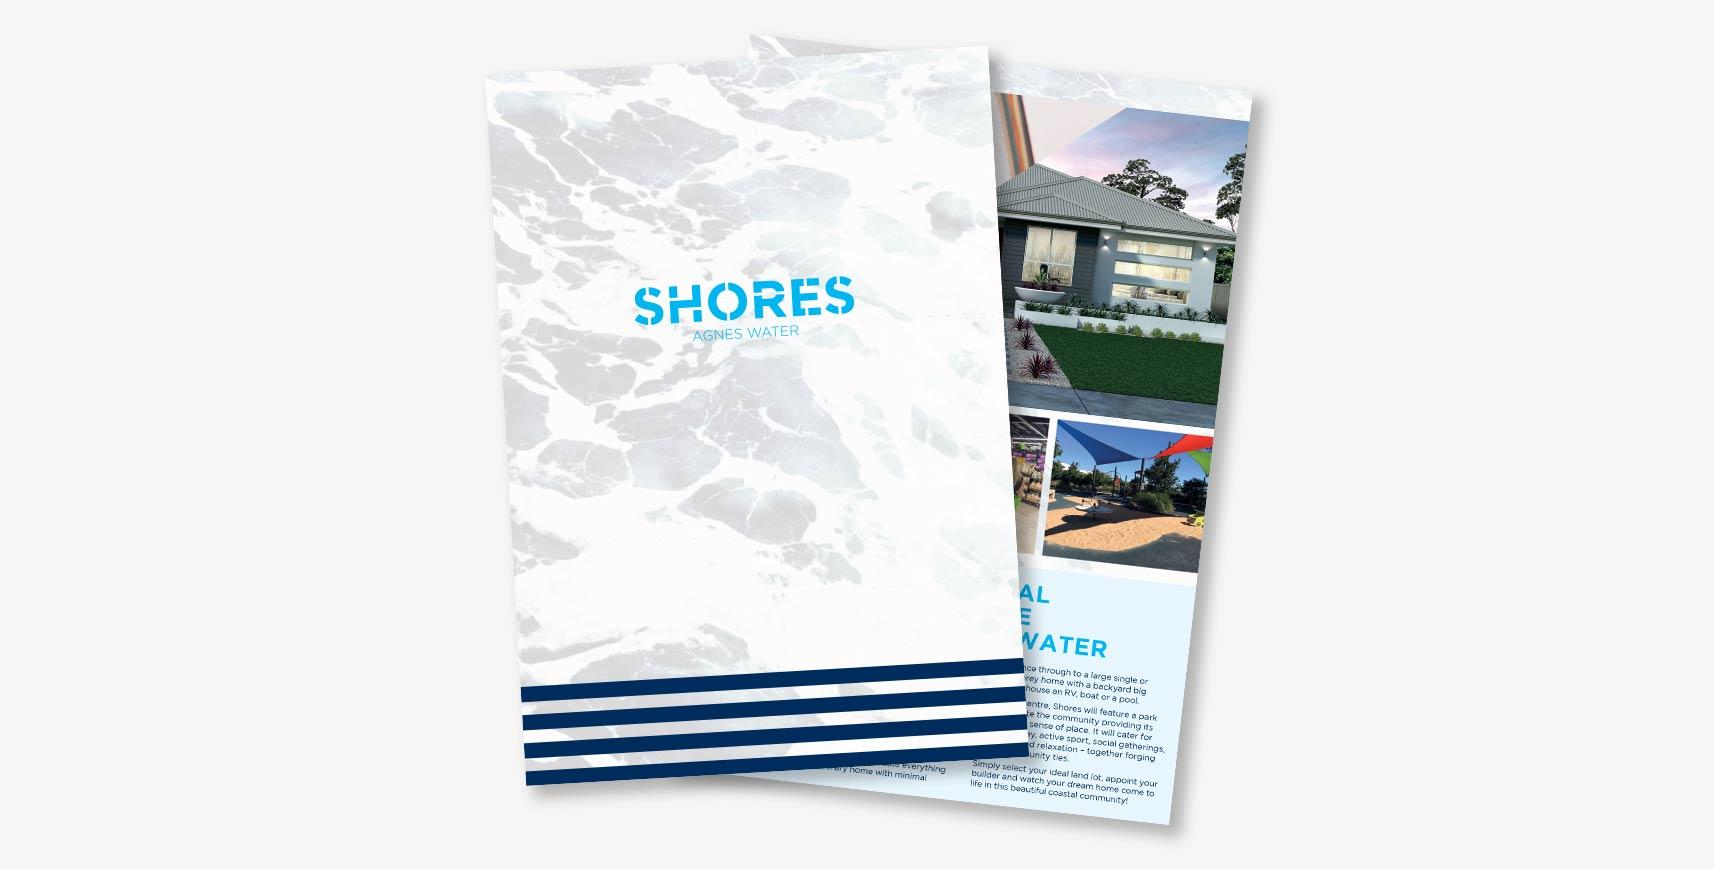 Shores-Brochure-mockup.jpg